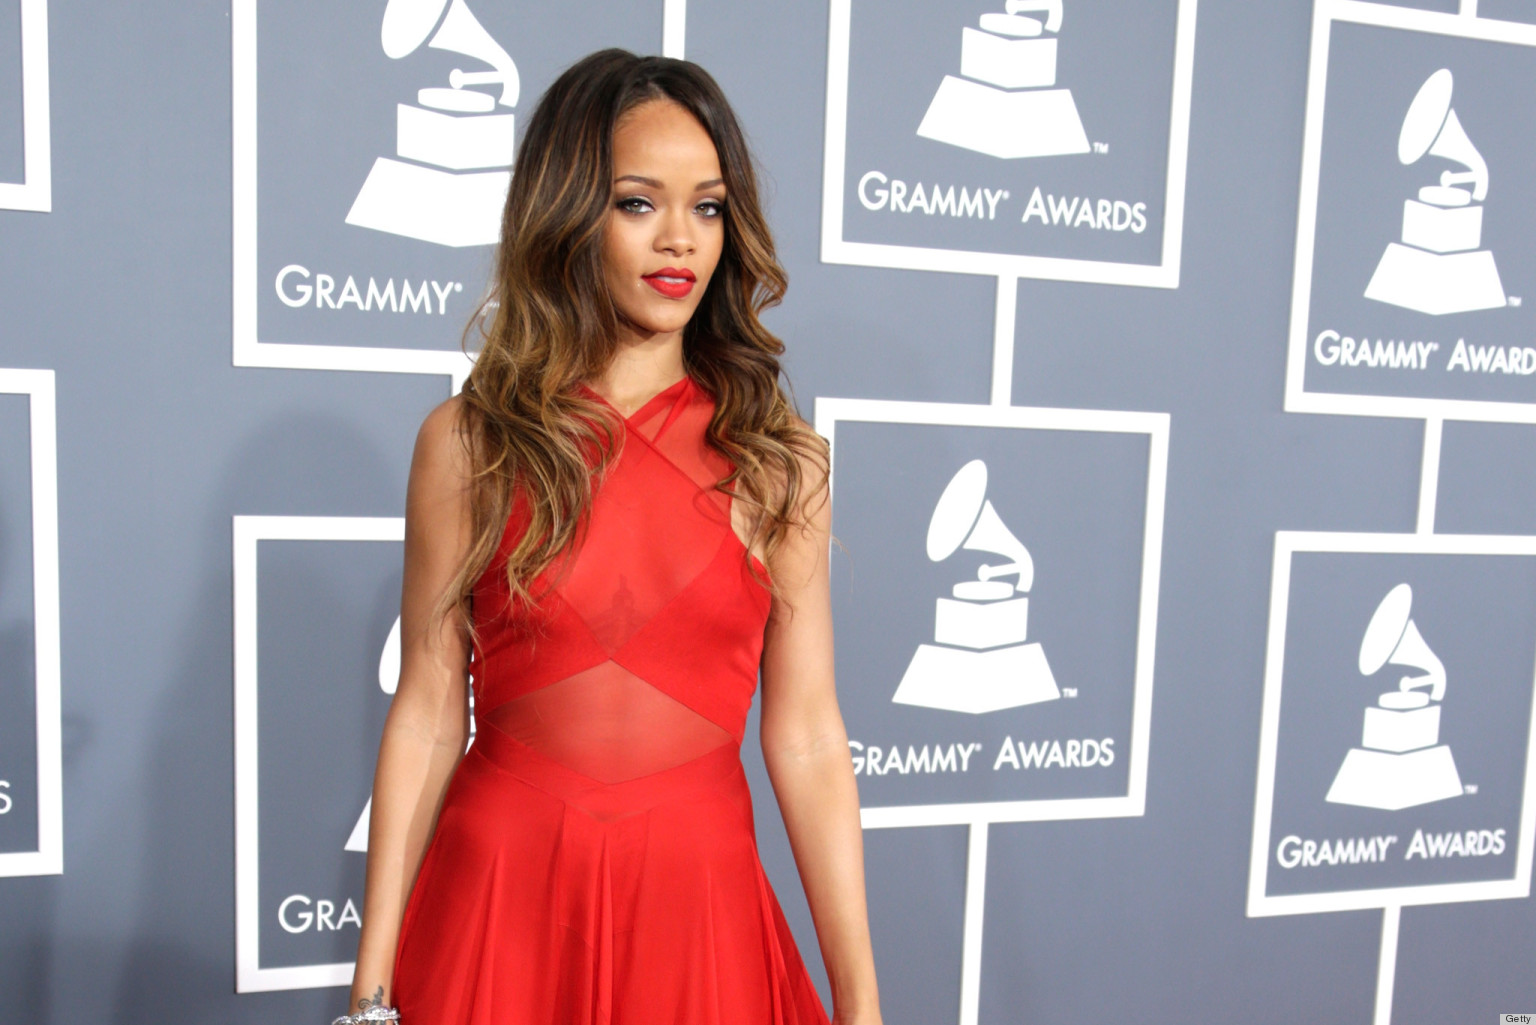 Grammys: Rihanna's Grammys Dress 2013 Overshadows Her Dubious